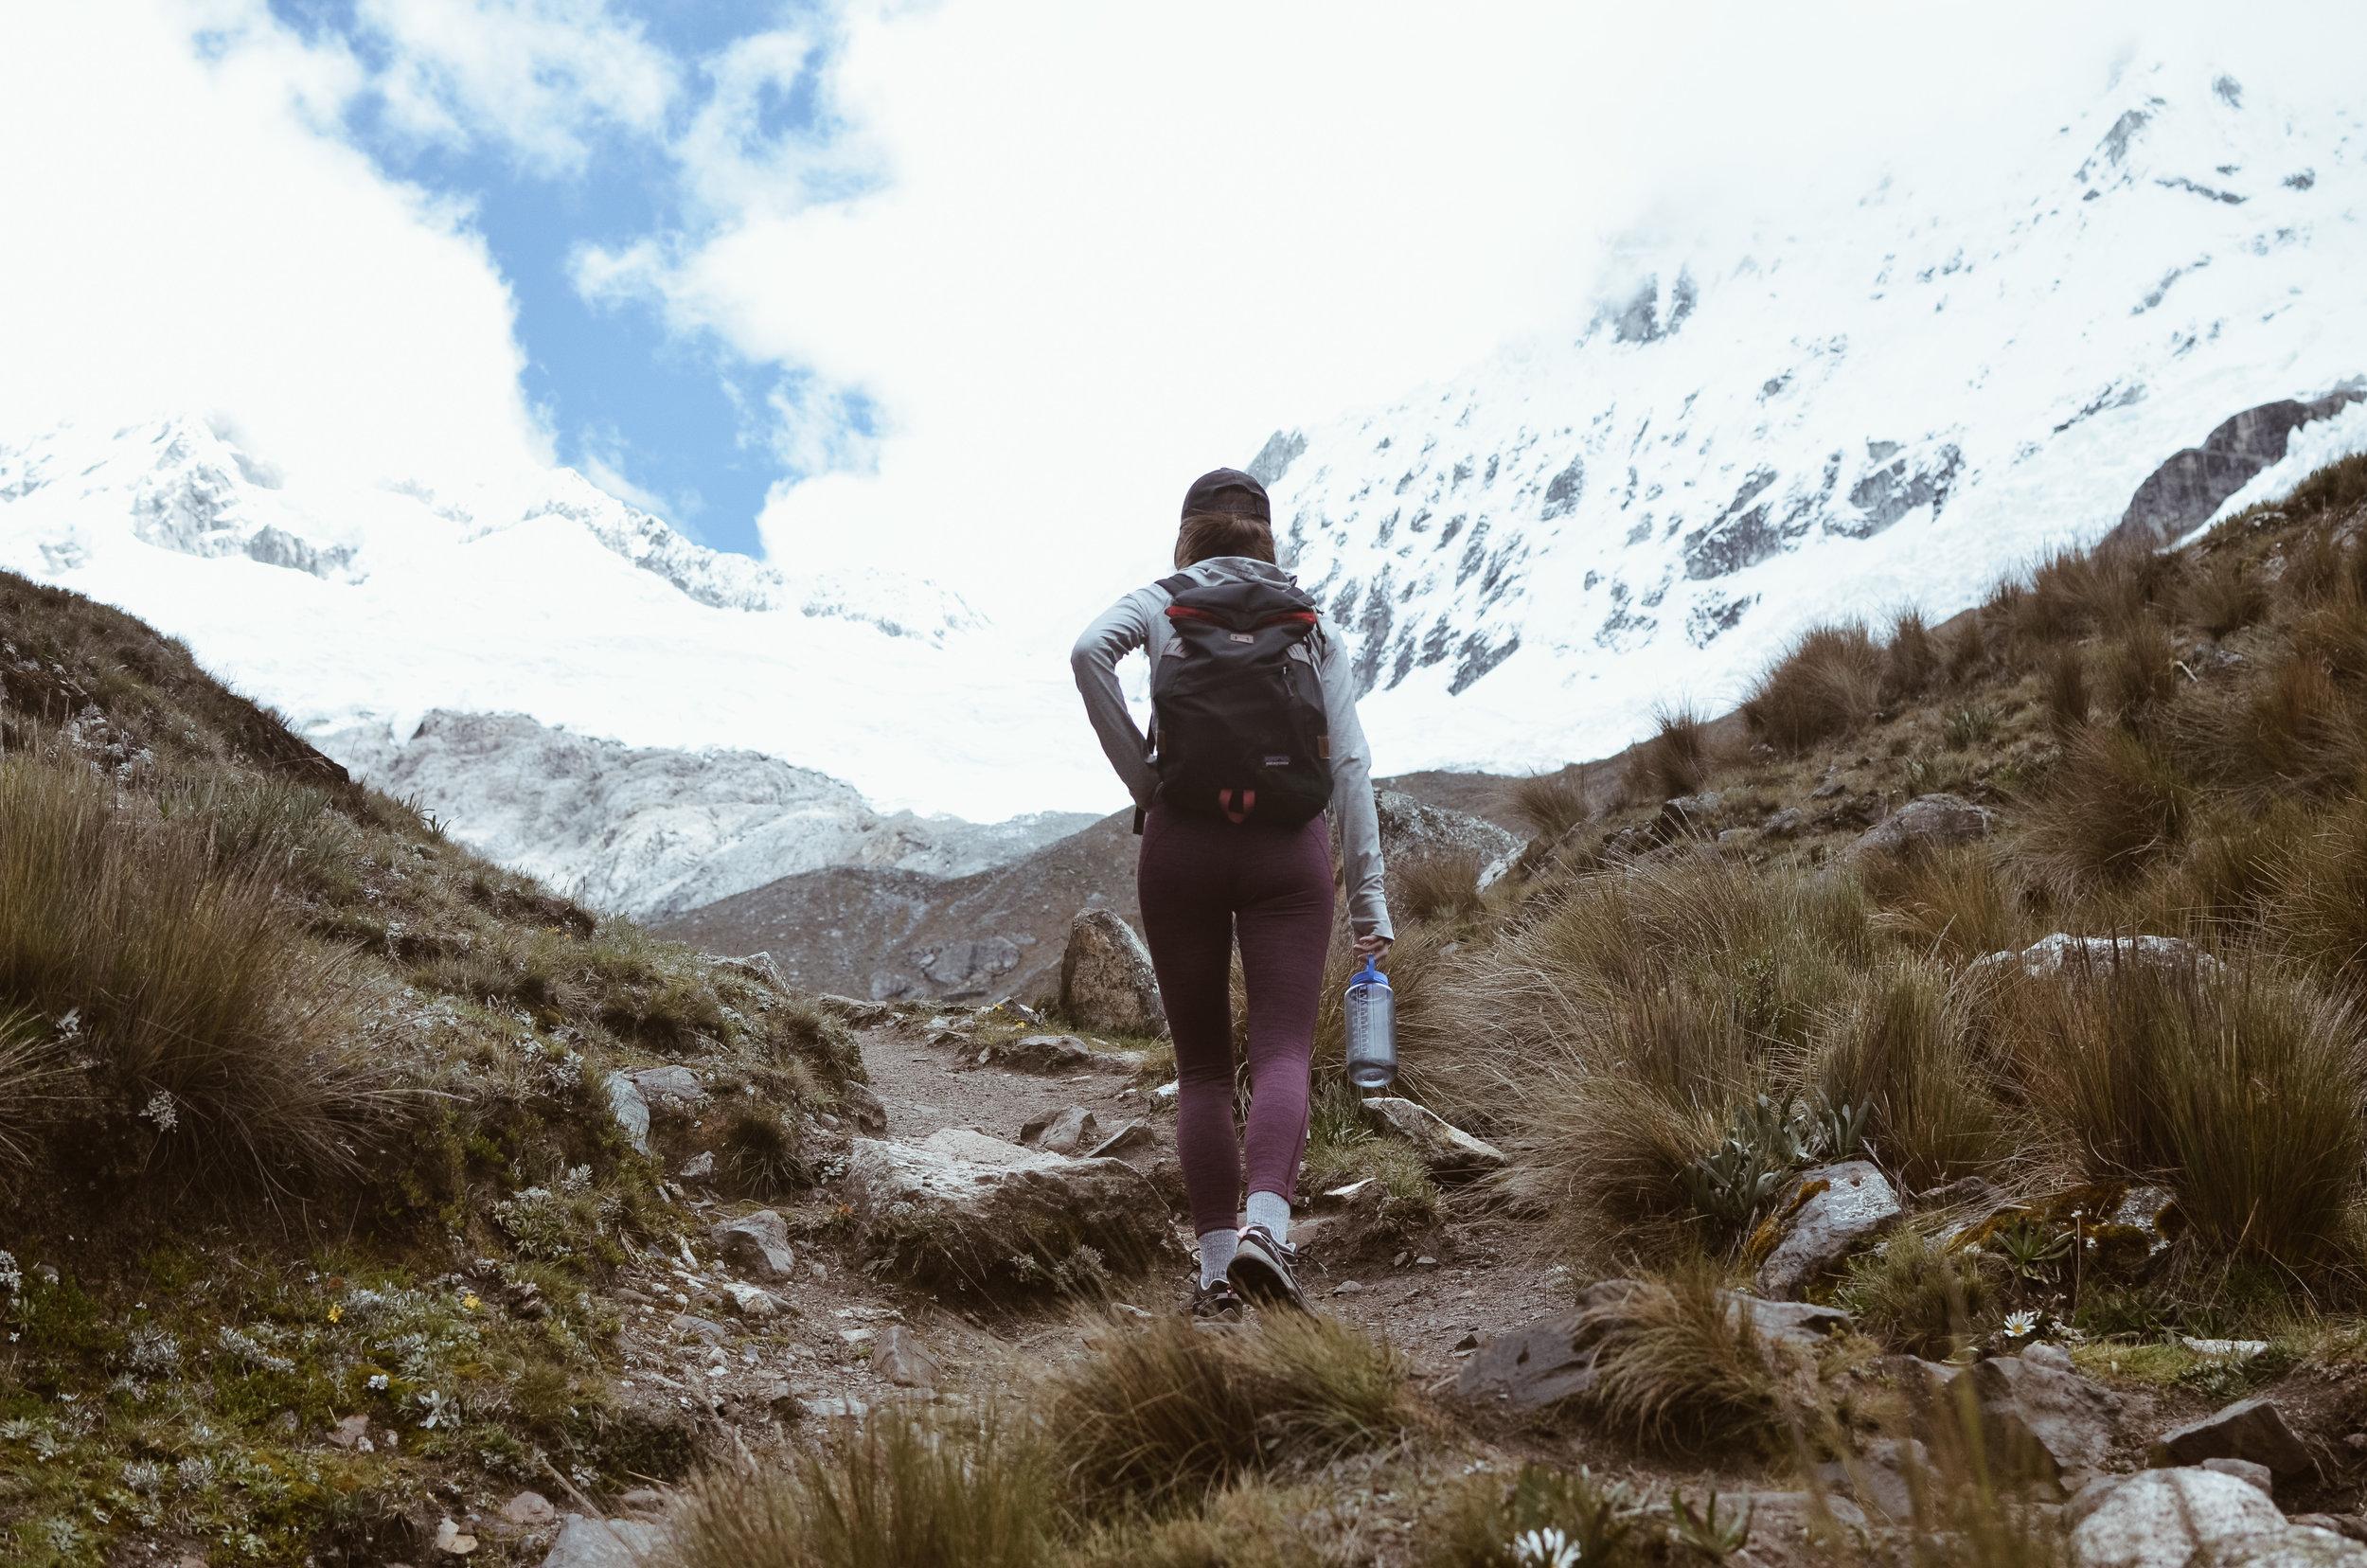 laguna+lake+69+hike+peru+travel+guide+life+on+pine_DSC_0490.jpg